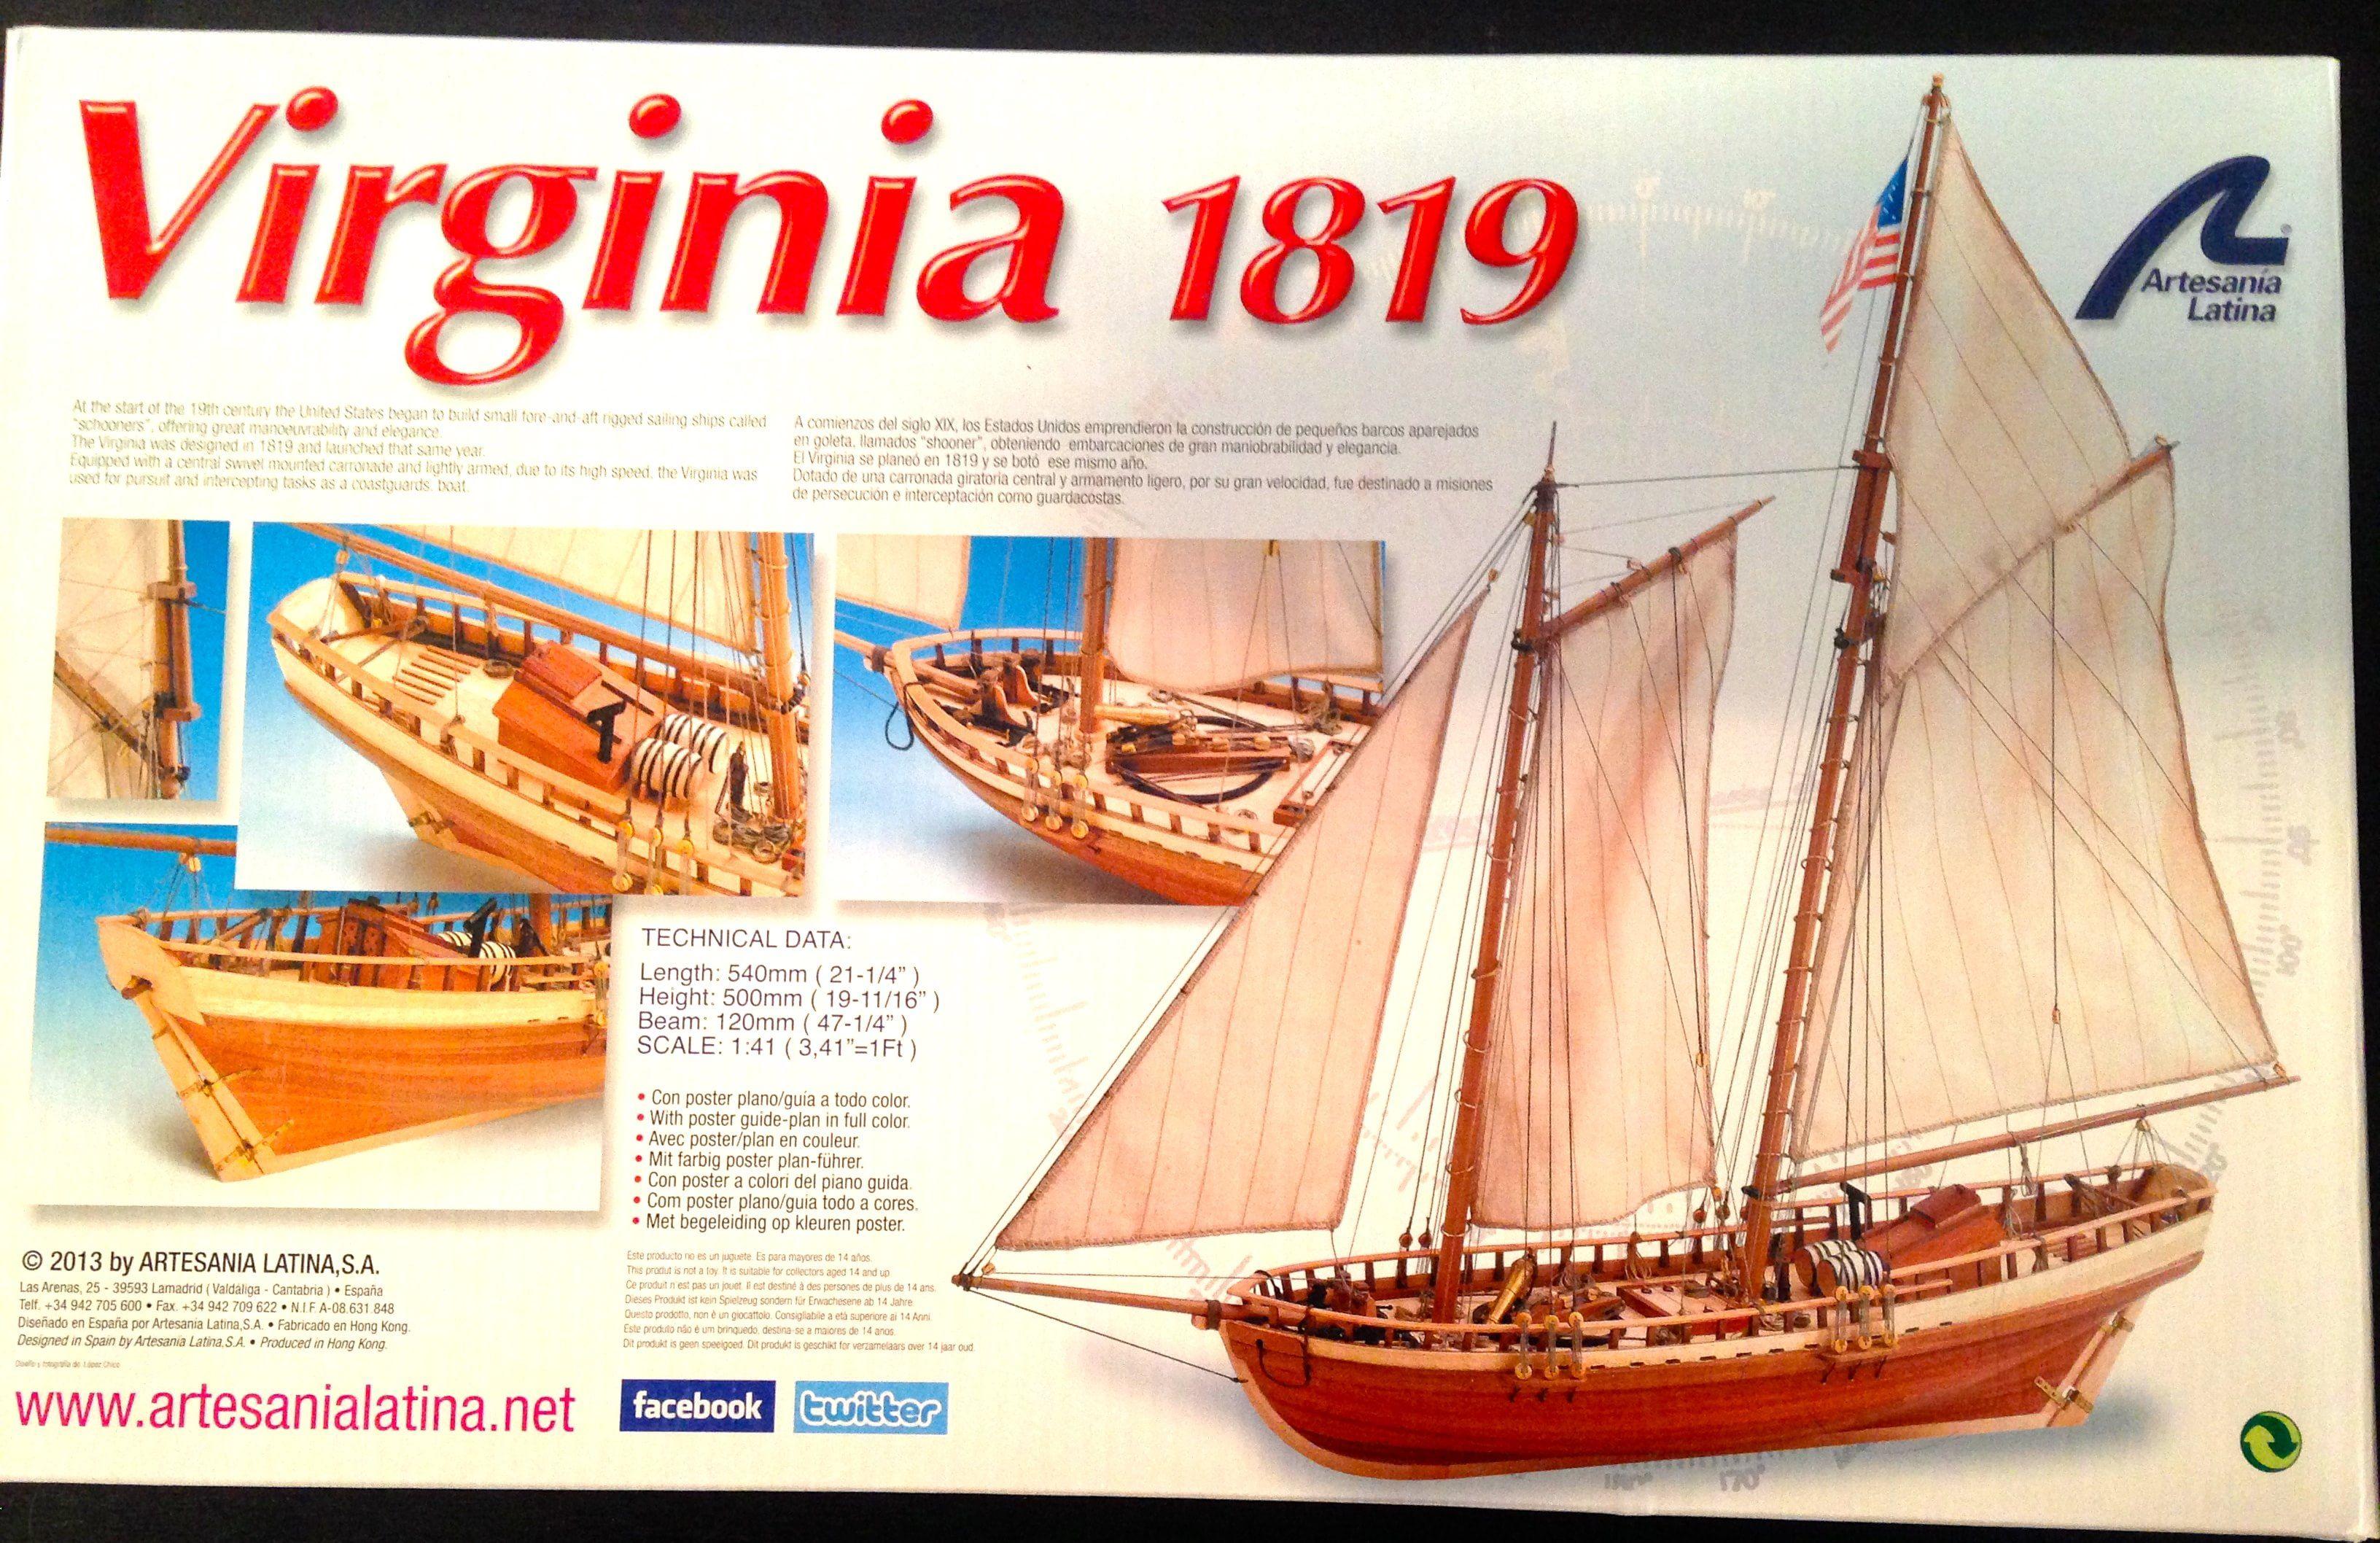 Virginia 1819 Model Ship Kit - Artesania Latina (22135)